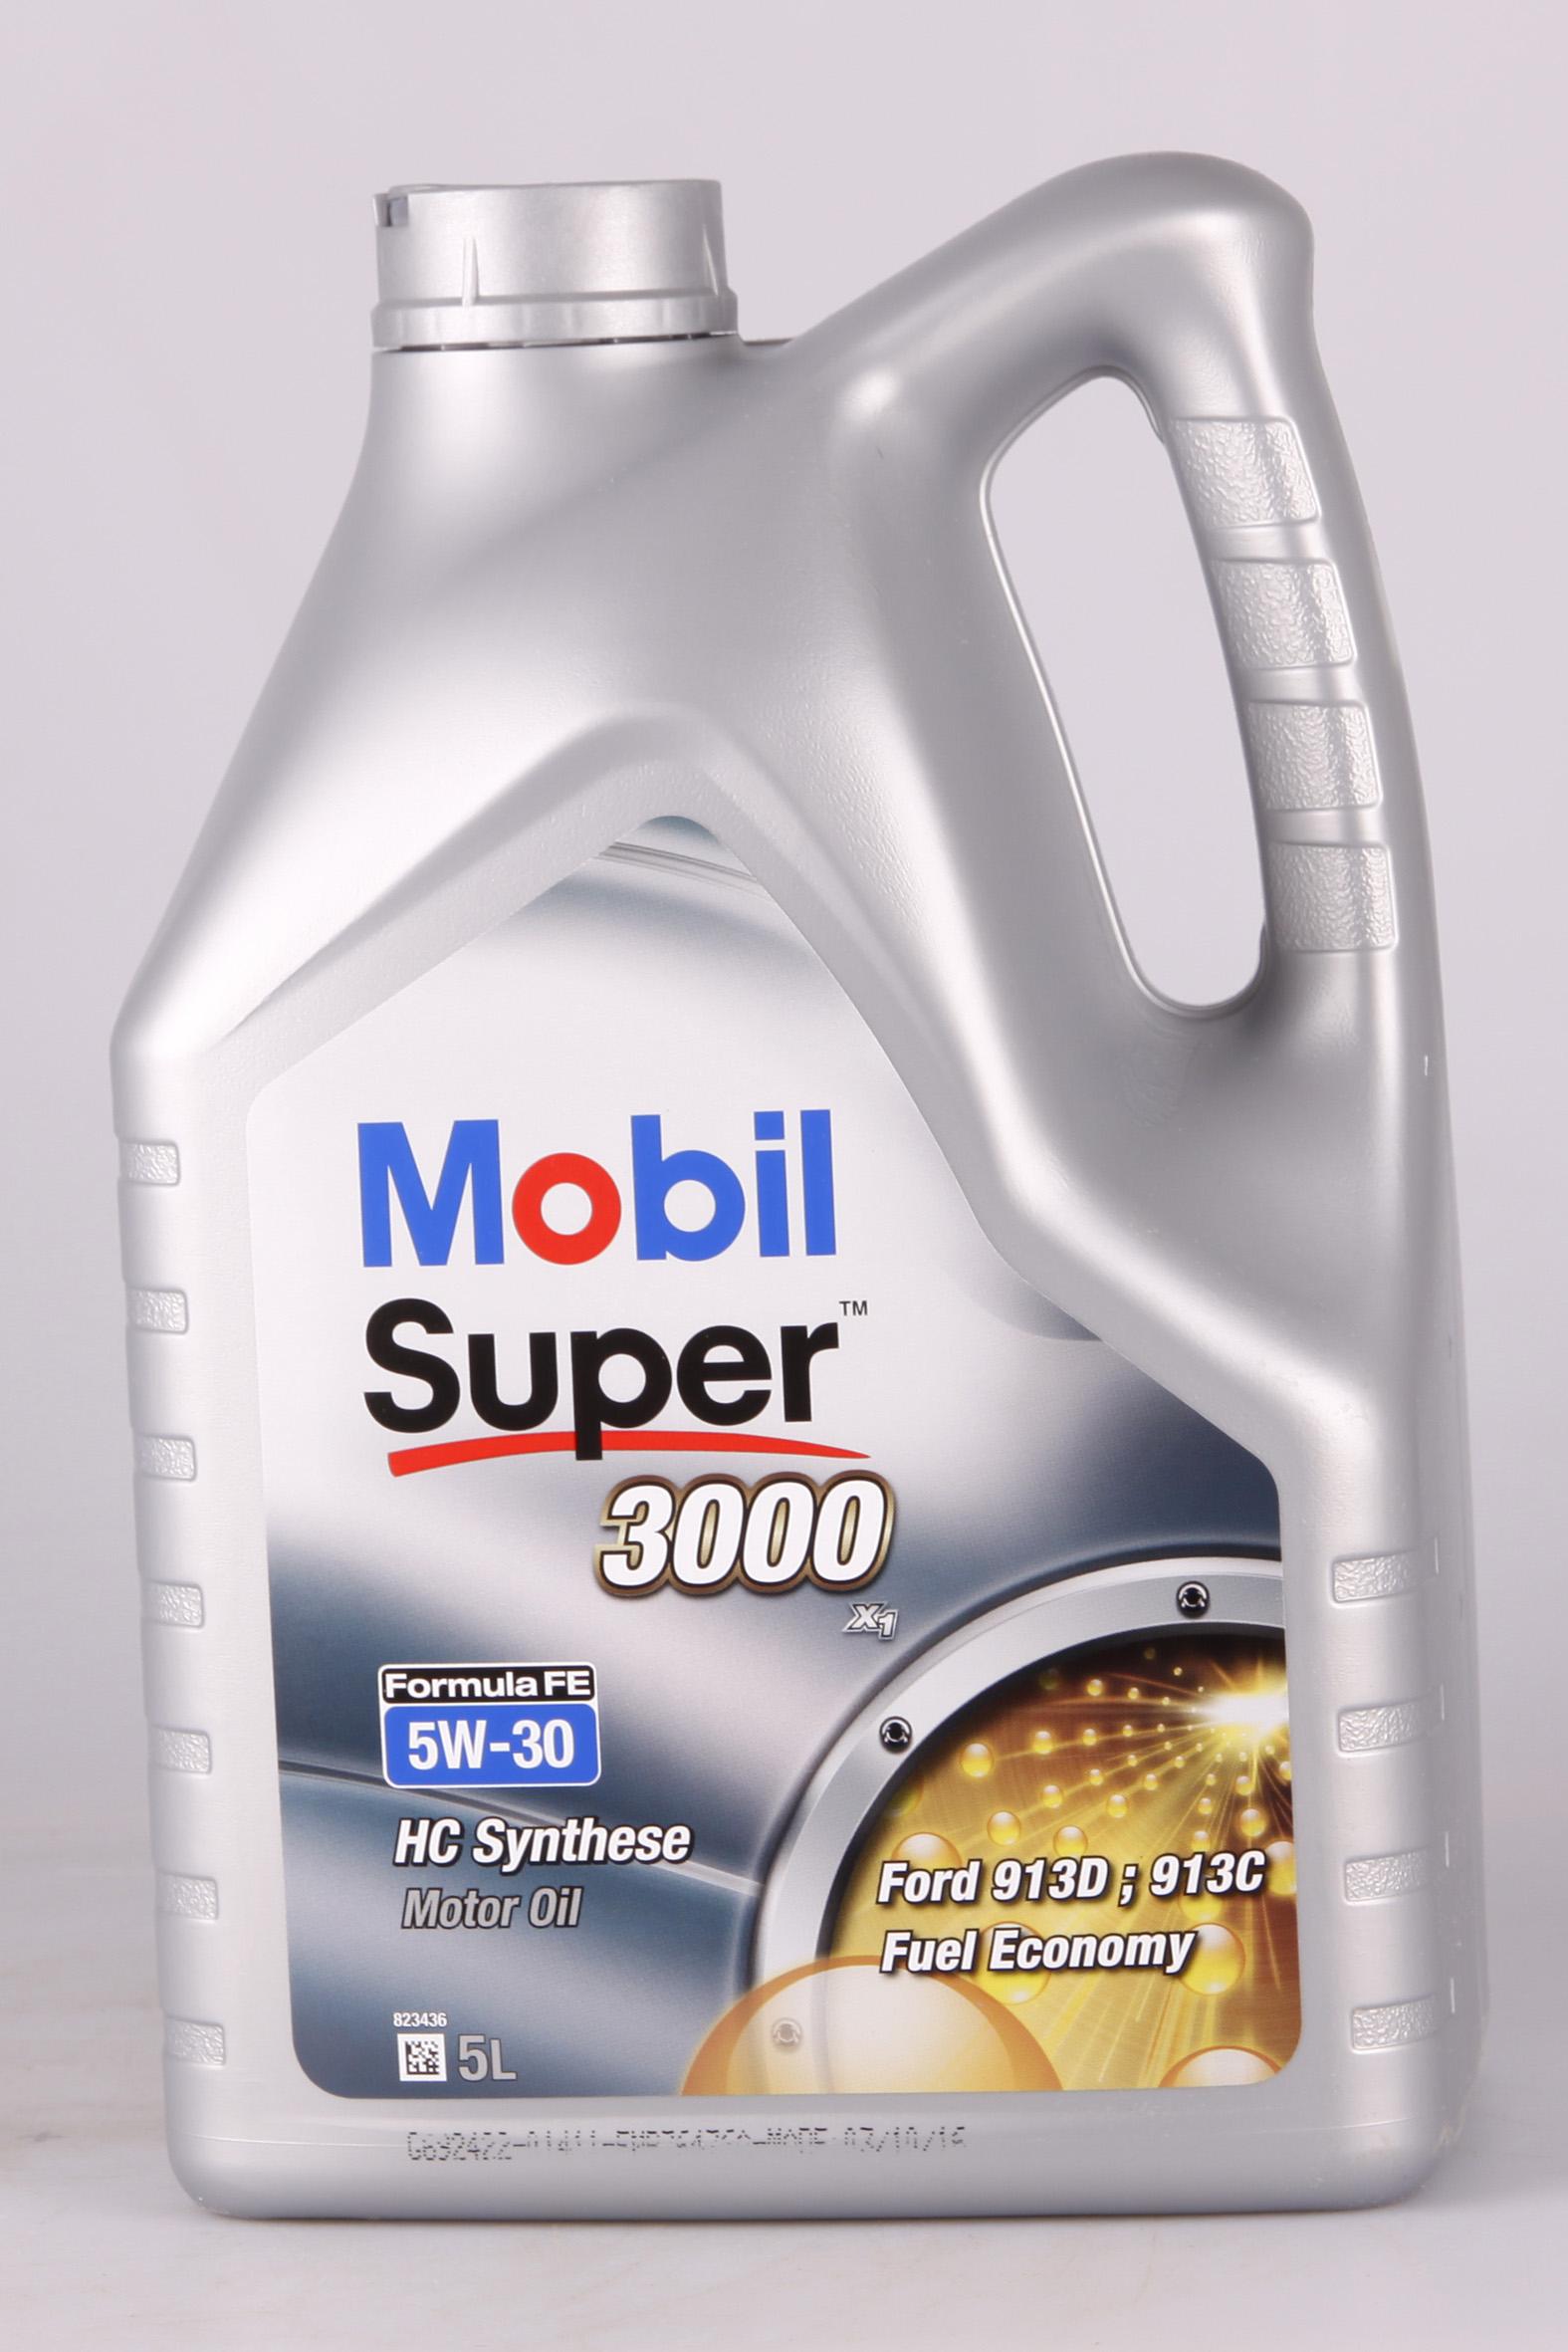 Mobil Super 3000 X1 Formula FE 5W-30 5 Liter